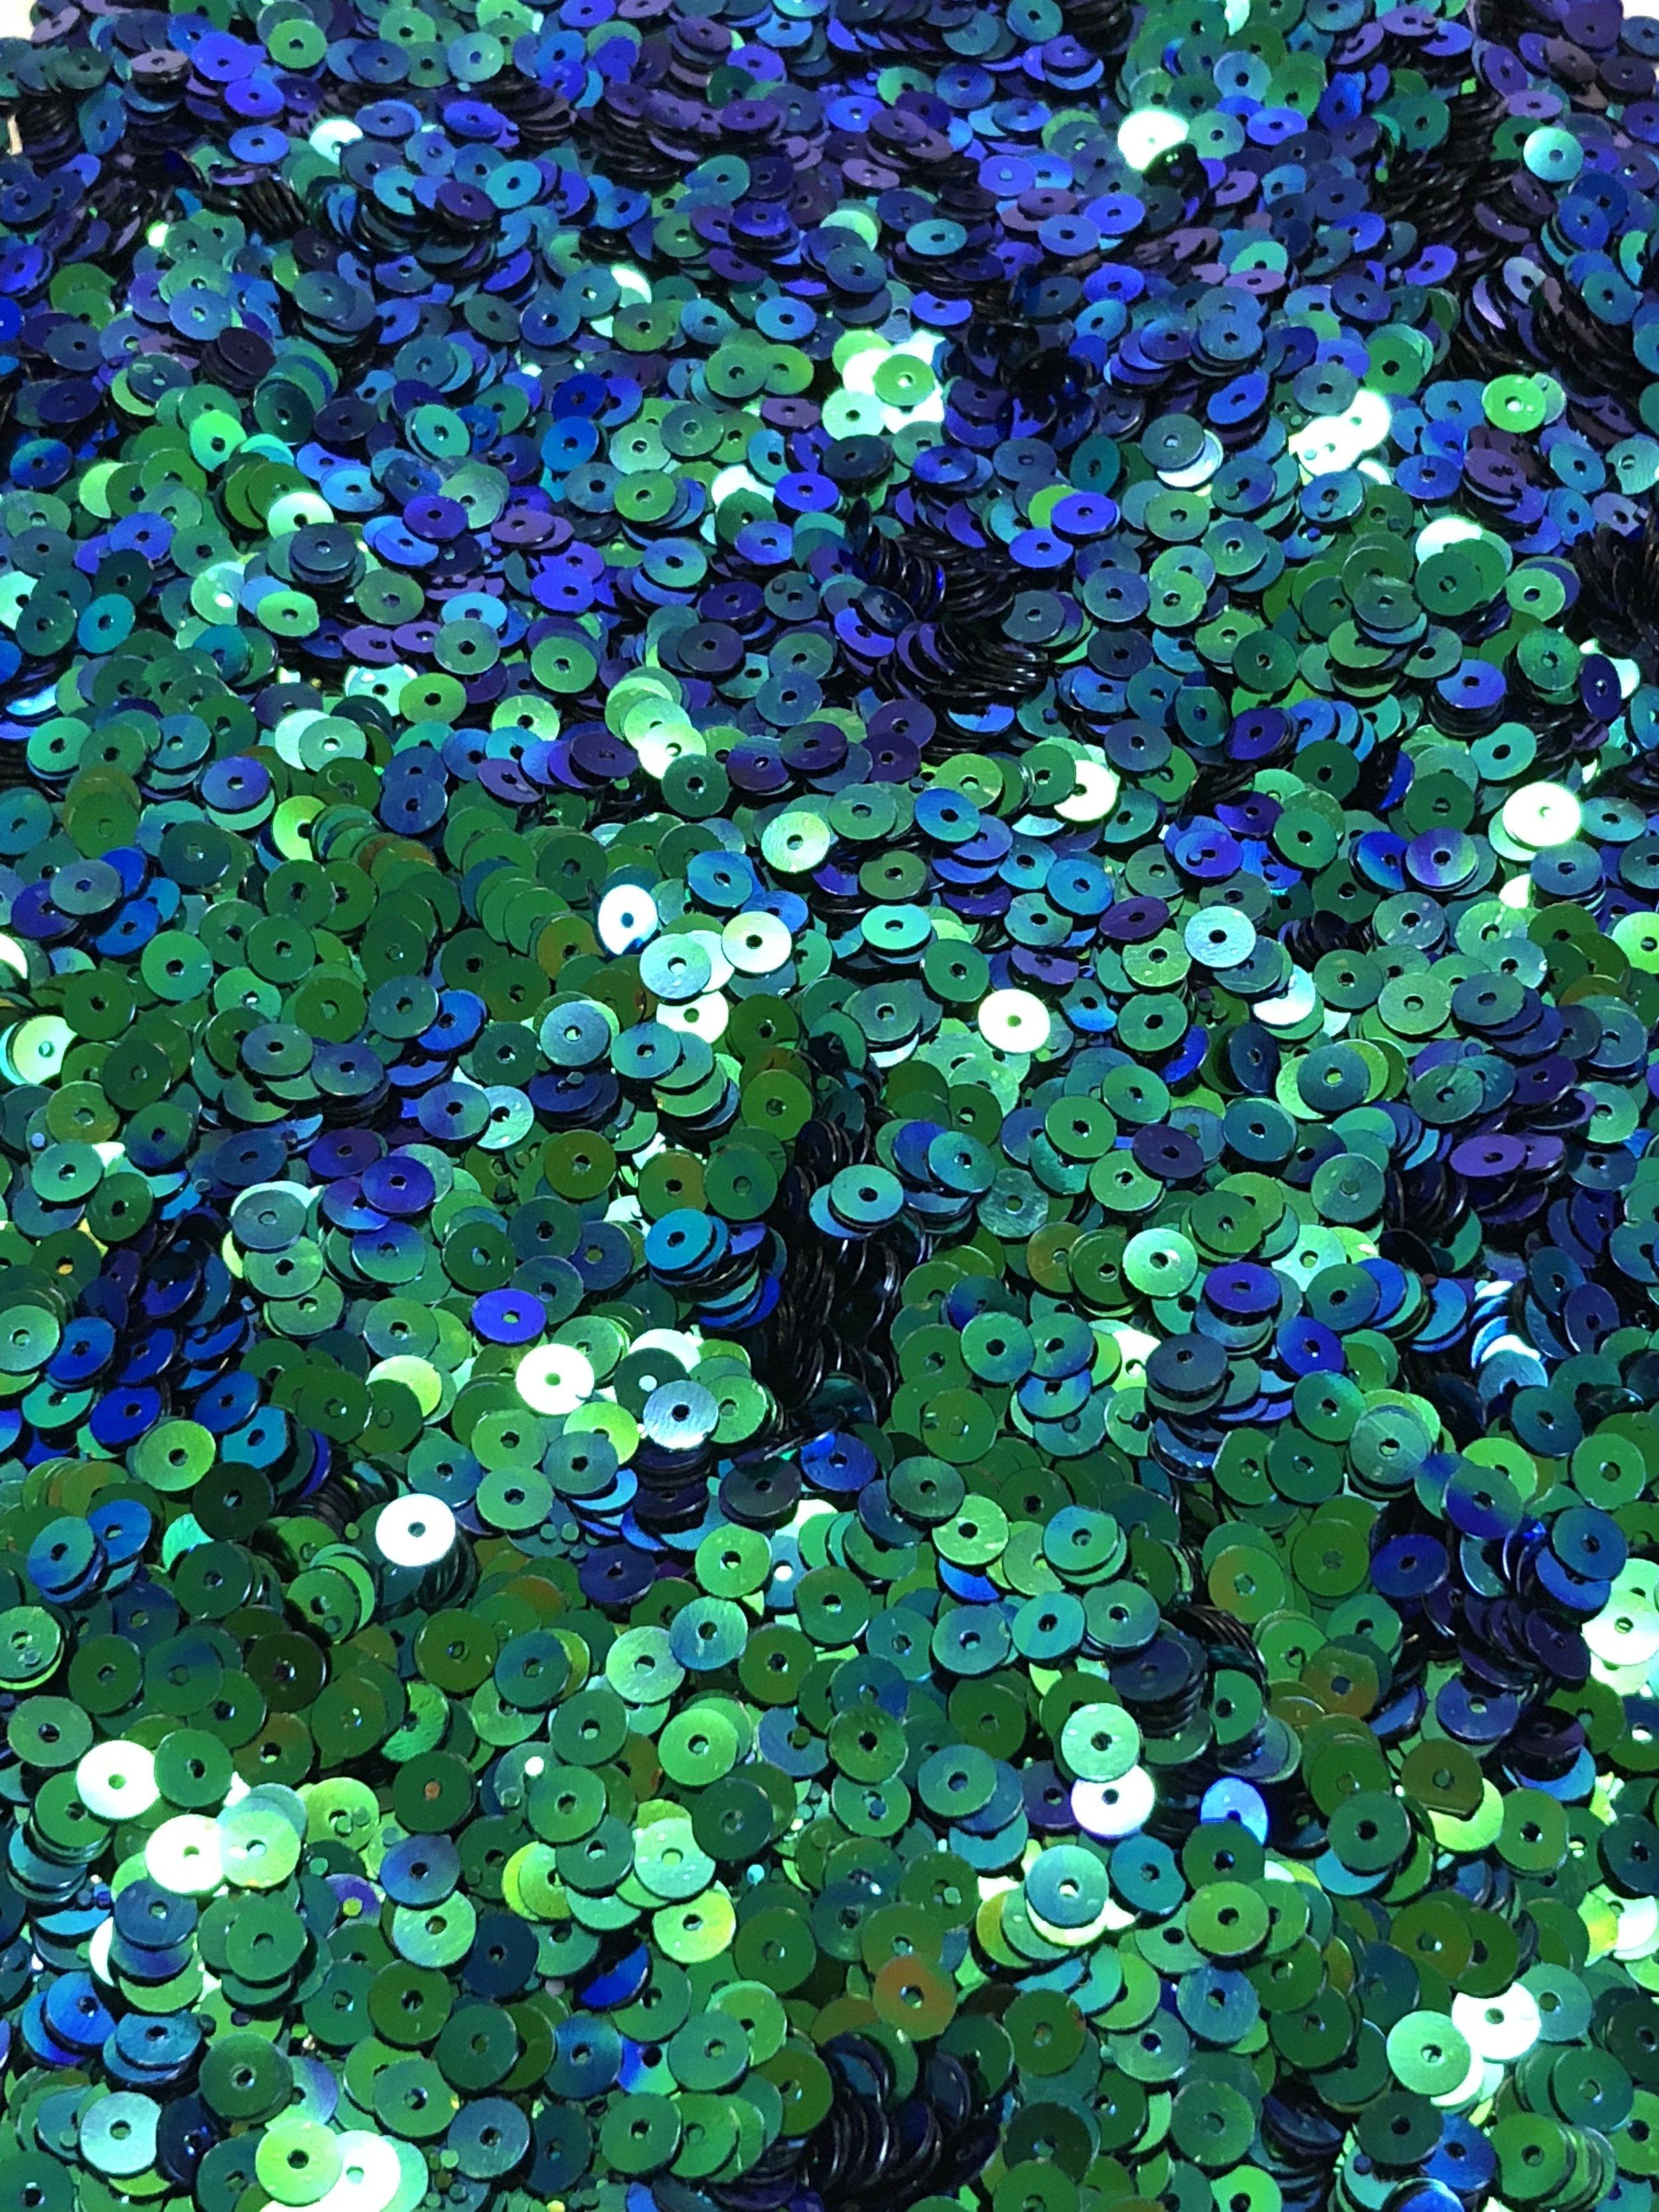 5mm Flat SequinsIridescent Emerald Green/Royal Blue - Bulk Loose Sequins (1/4 Pound)